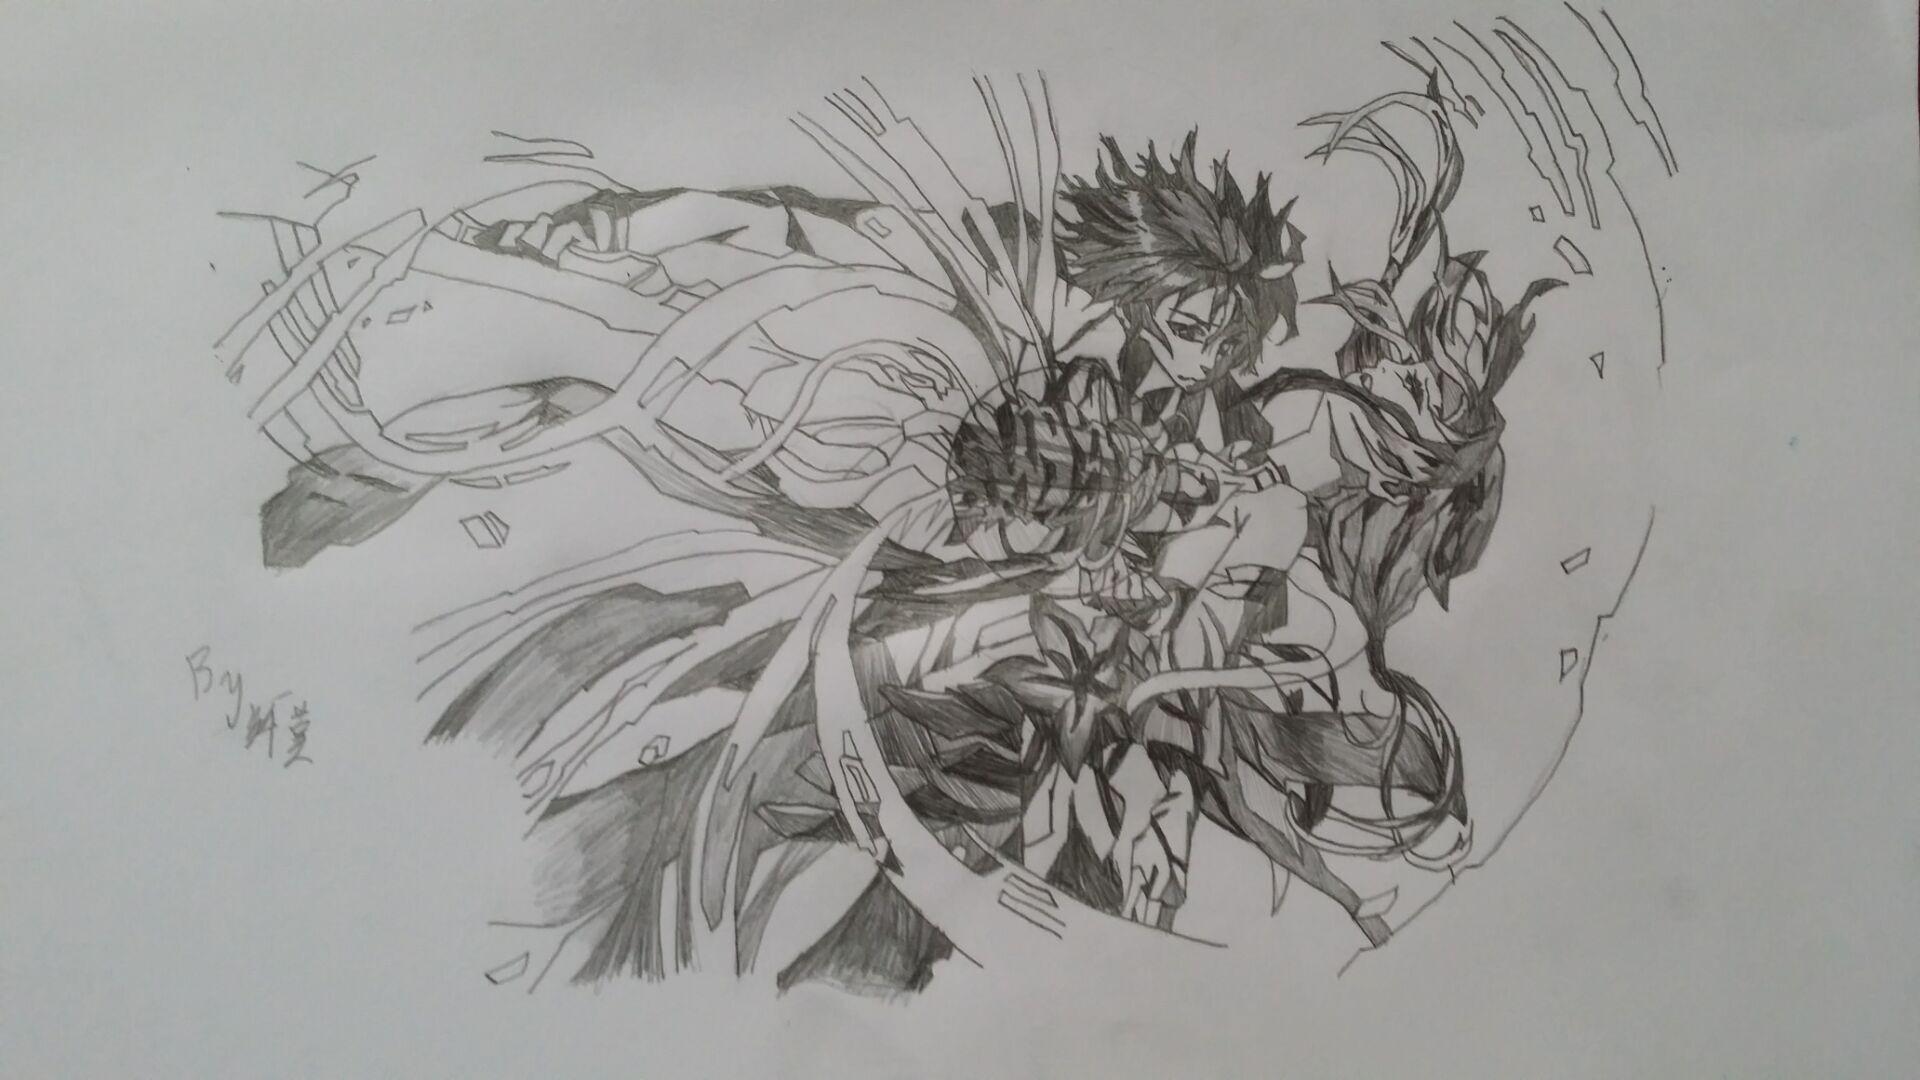 【dw丨纤莫】手绘罪恶王冠